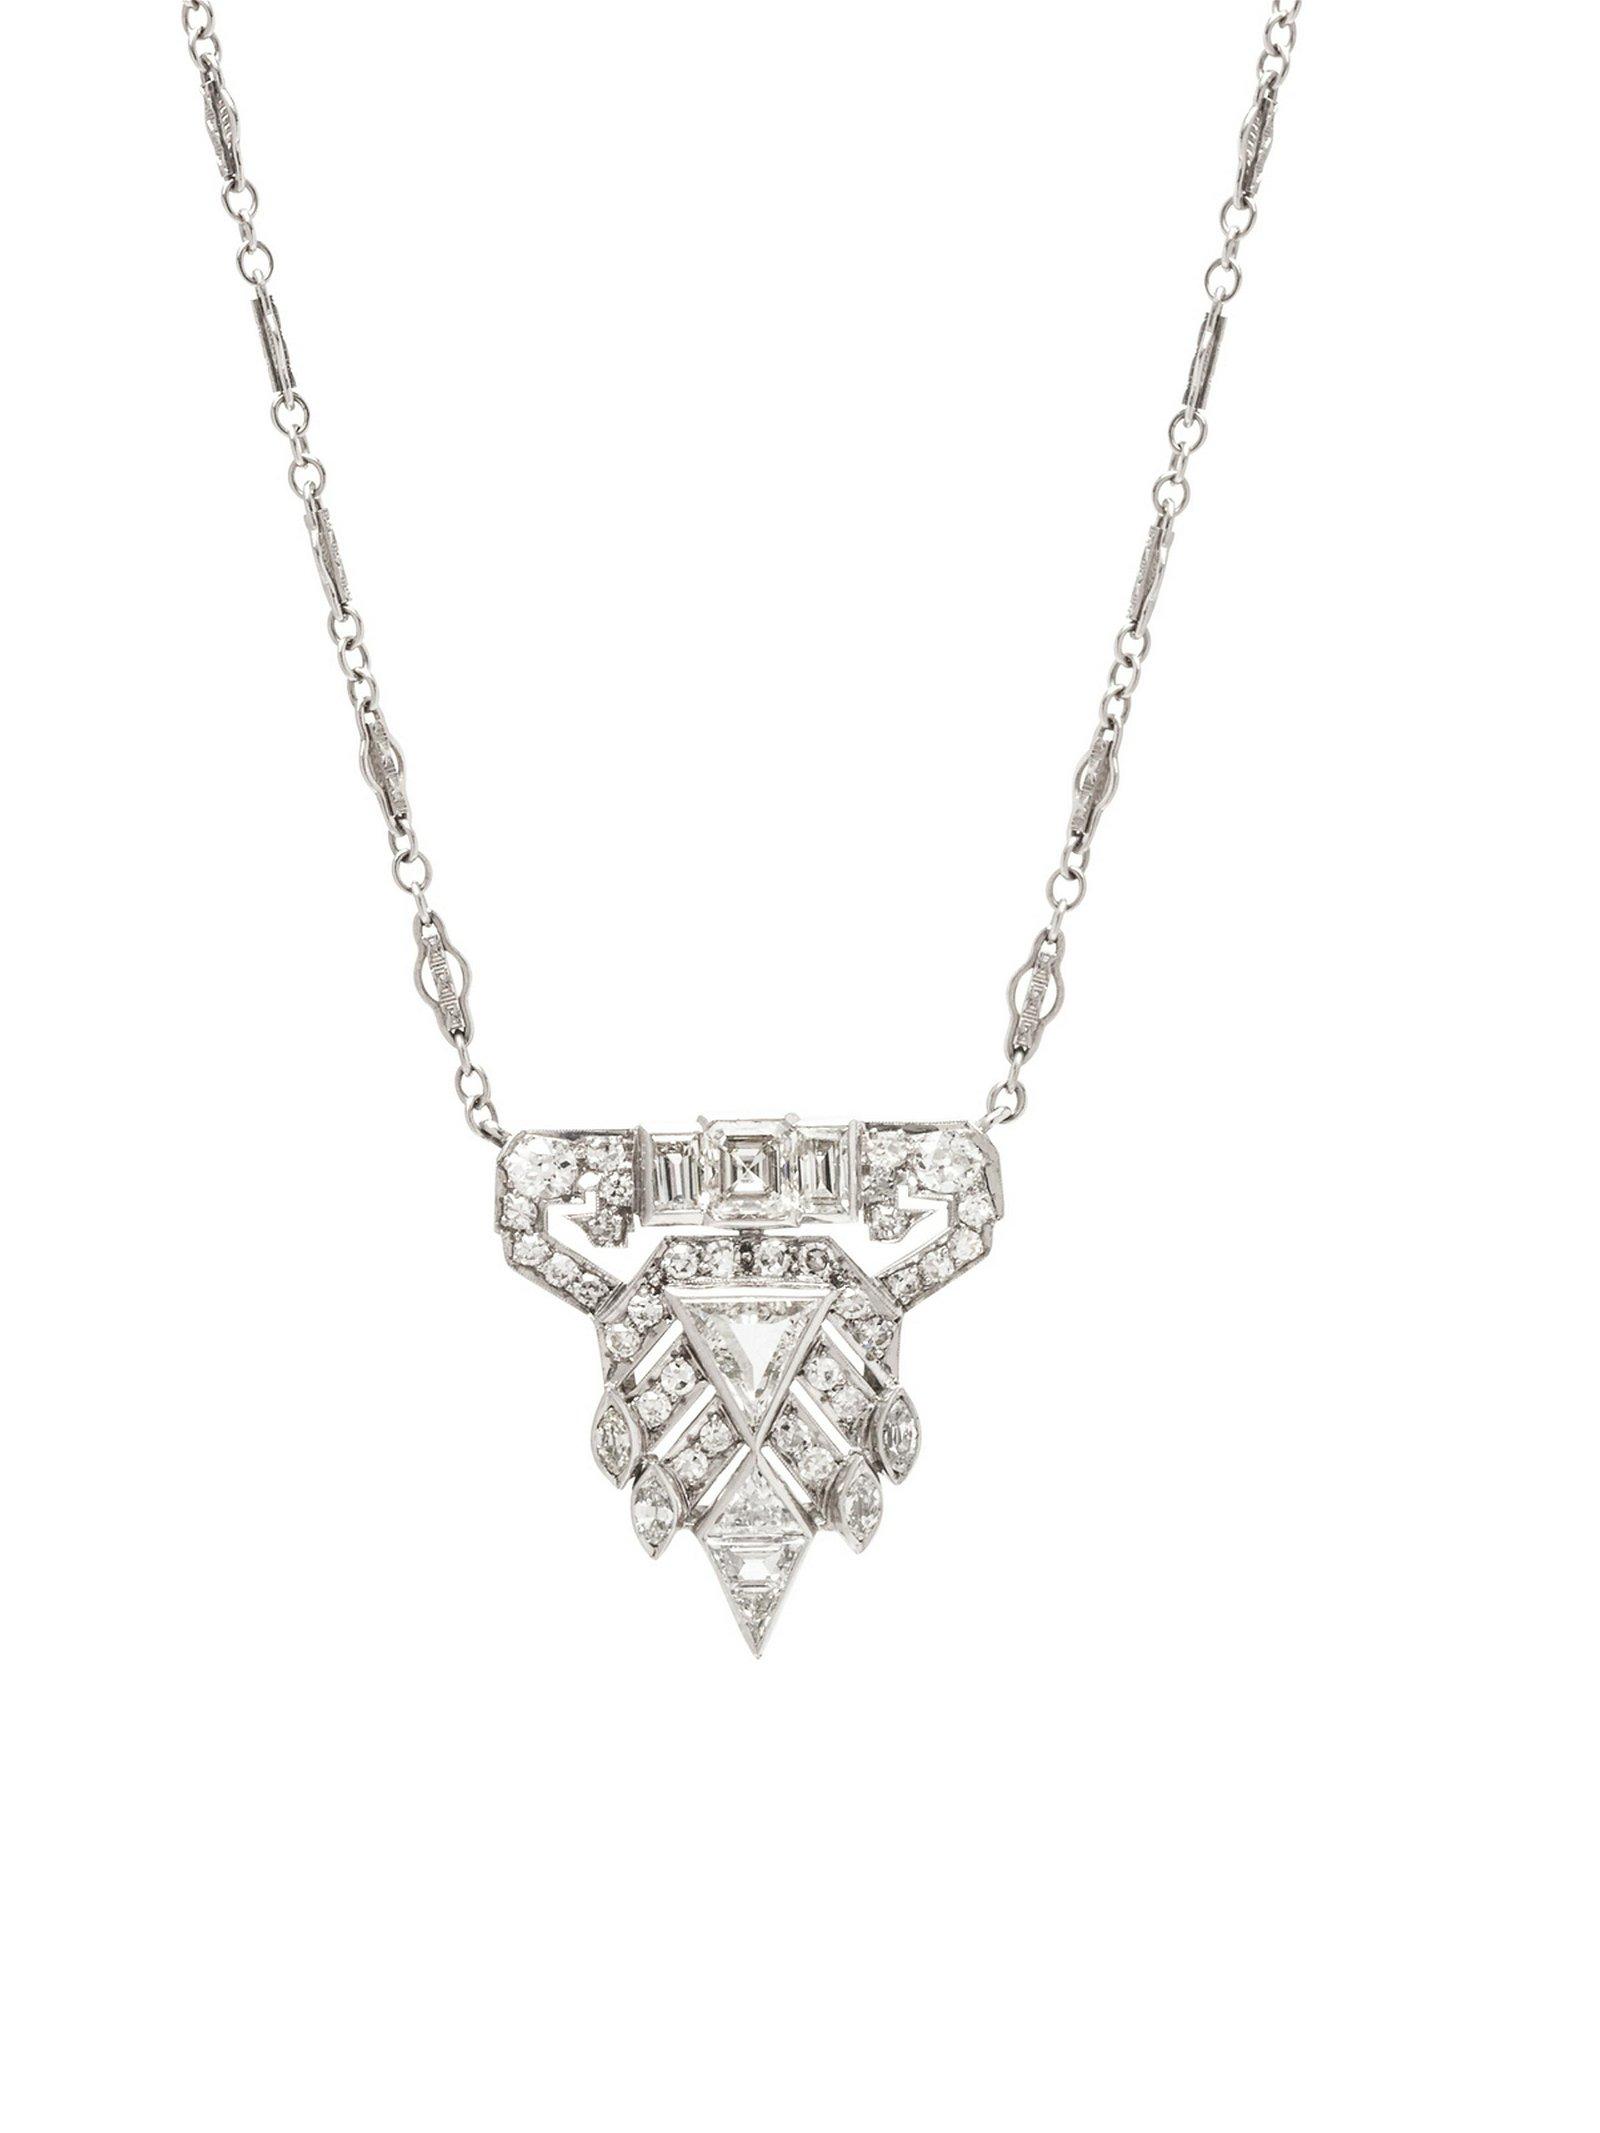 A Platinum, 14 Karat White Gold and Diamond Necklace,